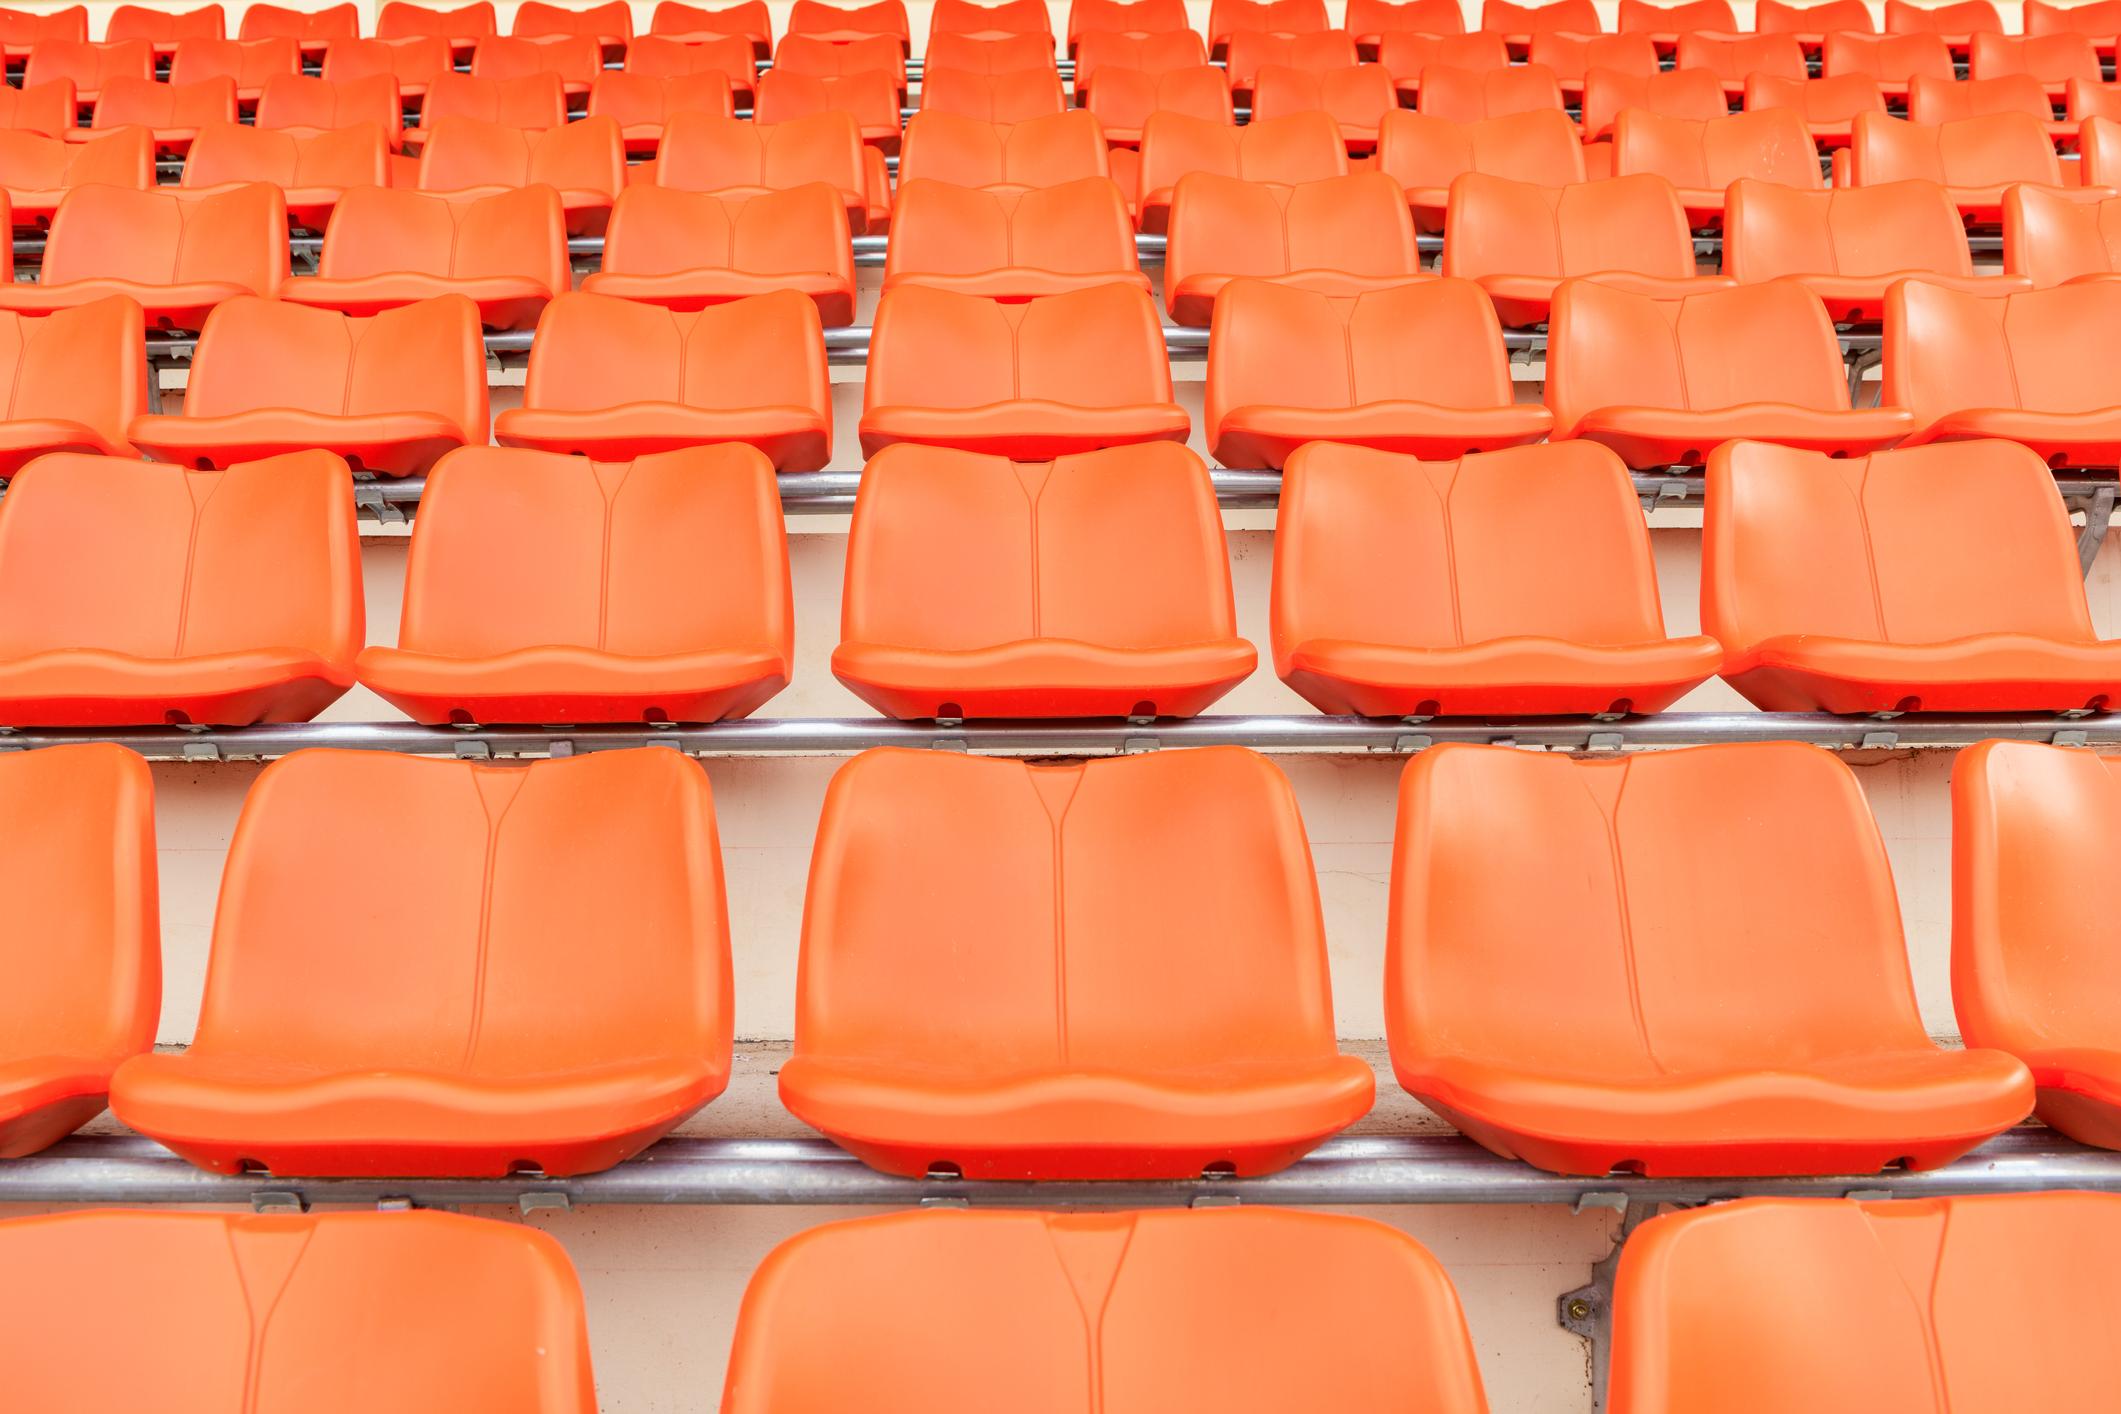 Empty seats audience personas